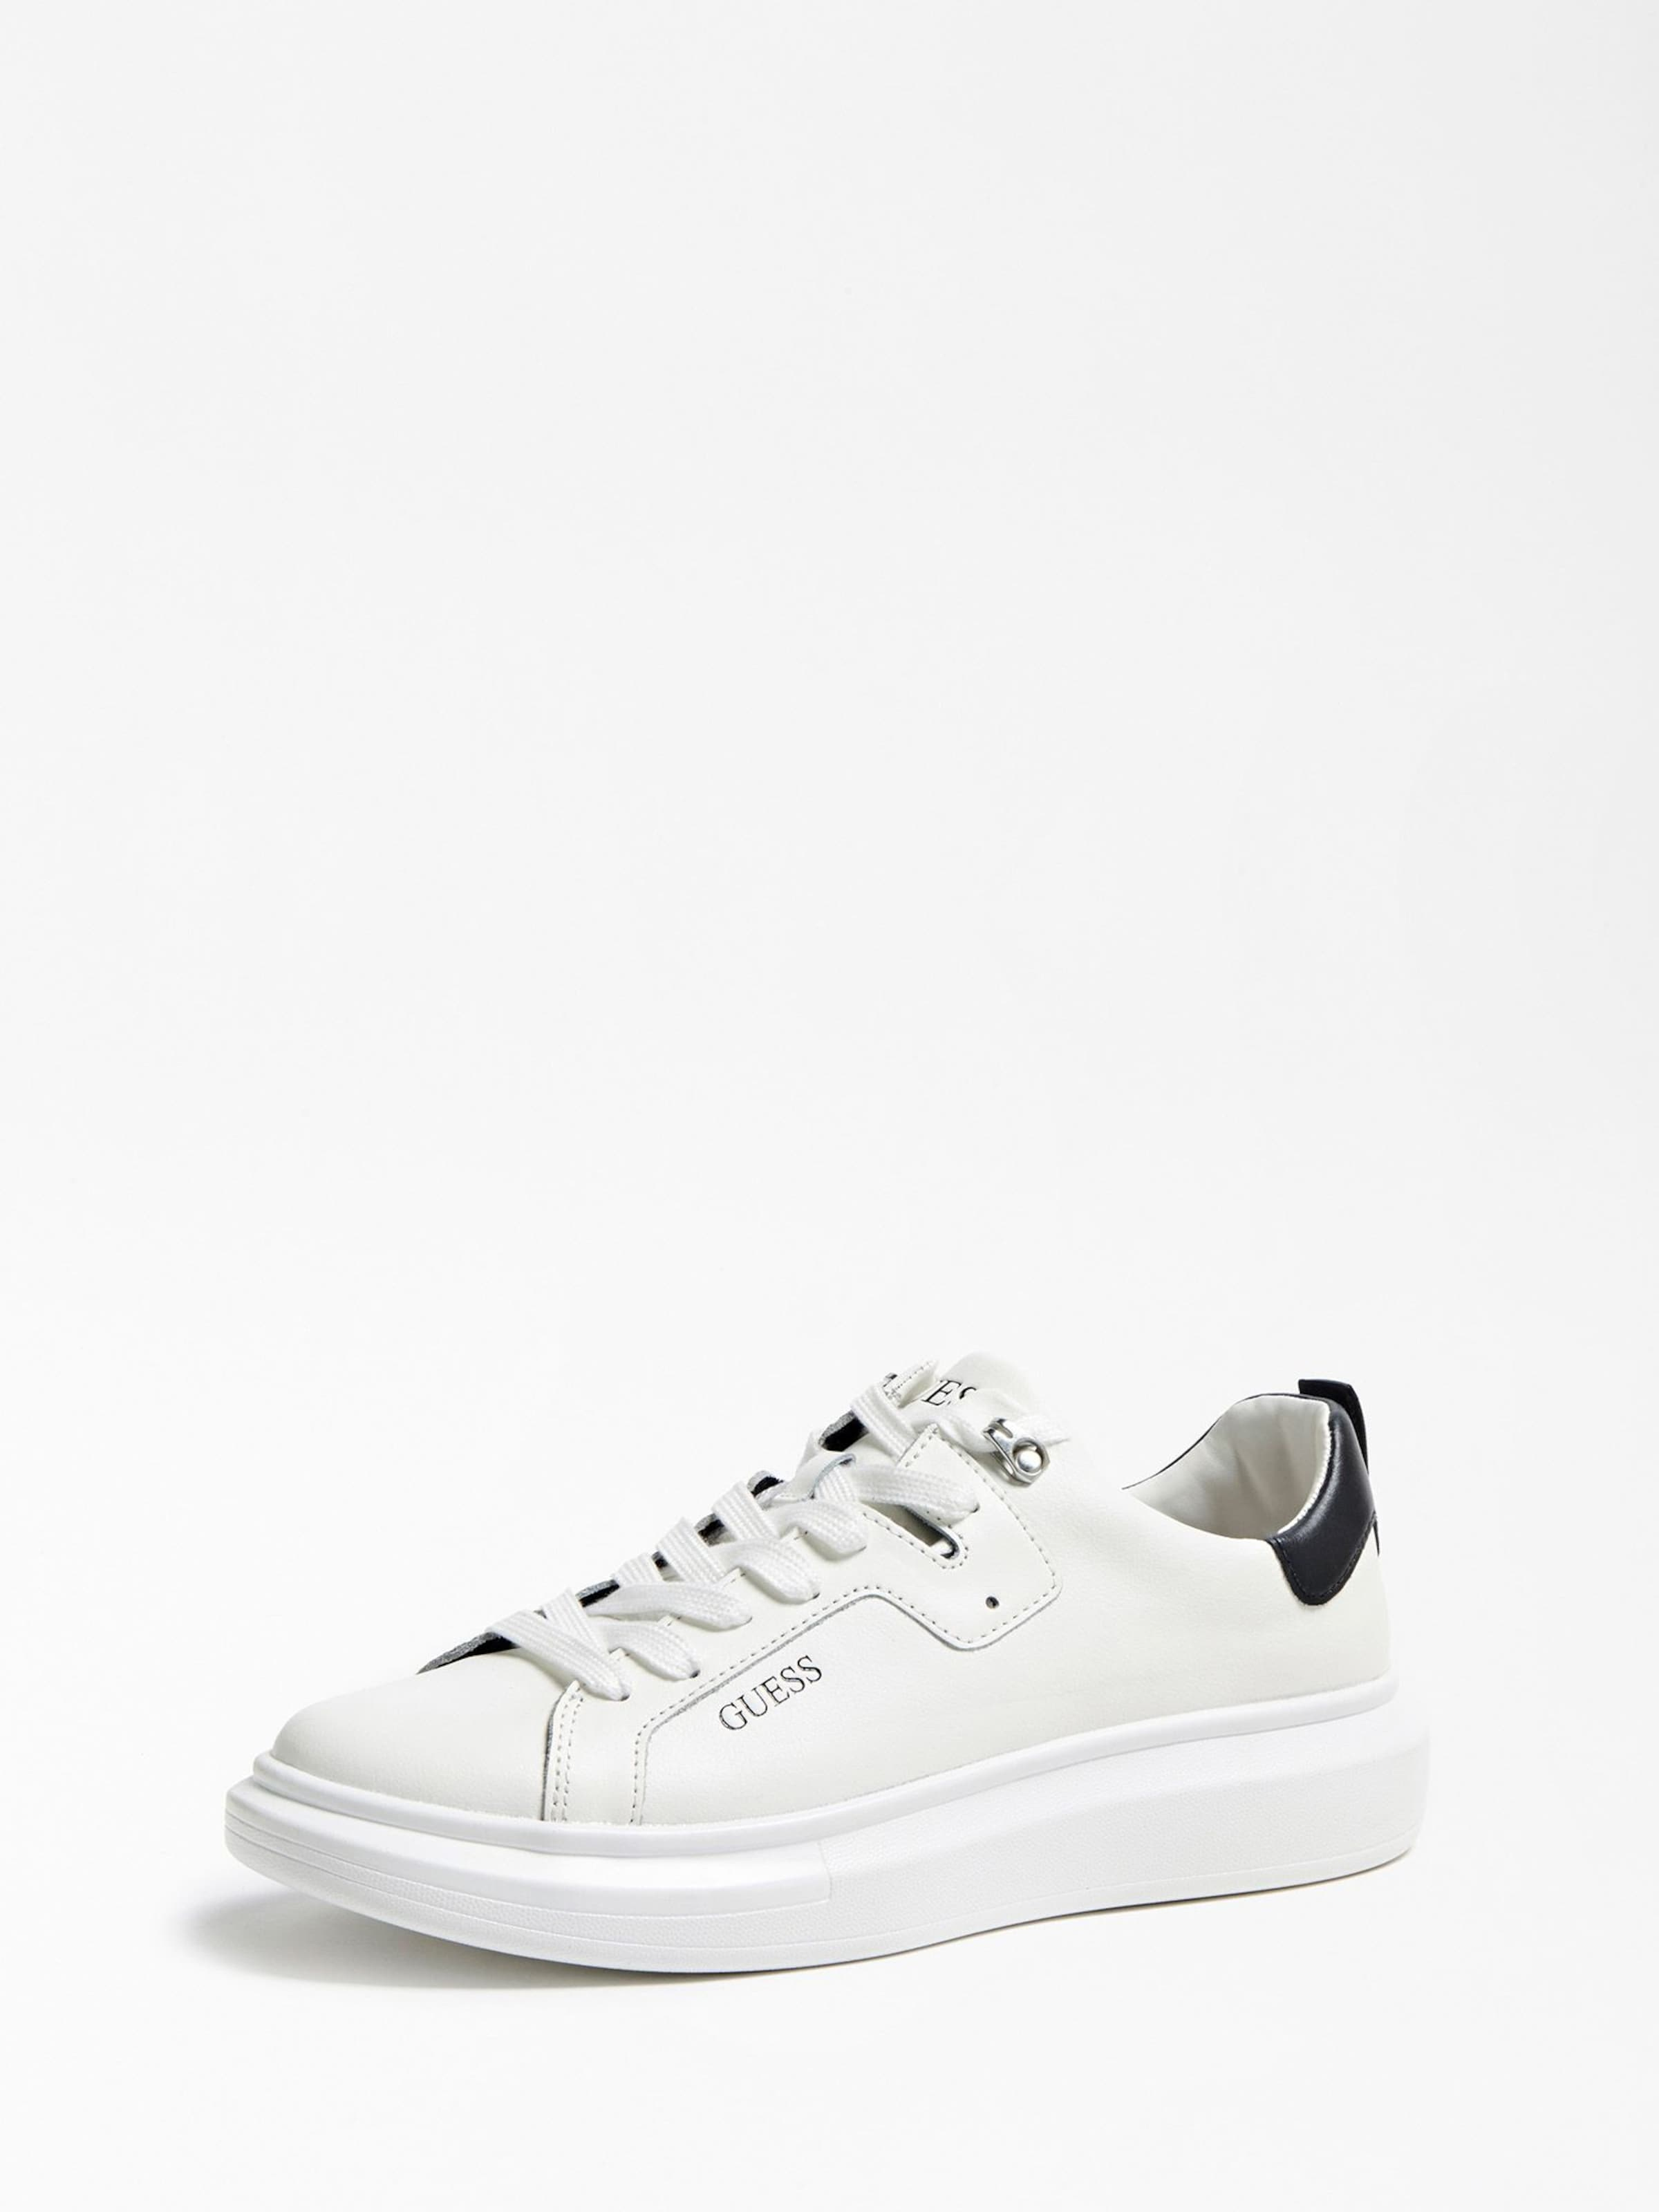 Guess In Sneaker Sneaker Guess Weiß In QthsrdCx